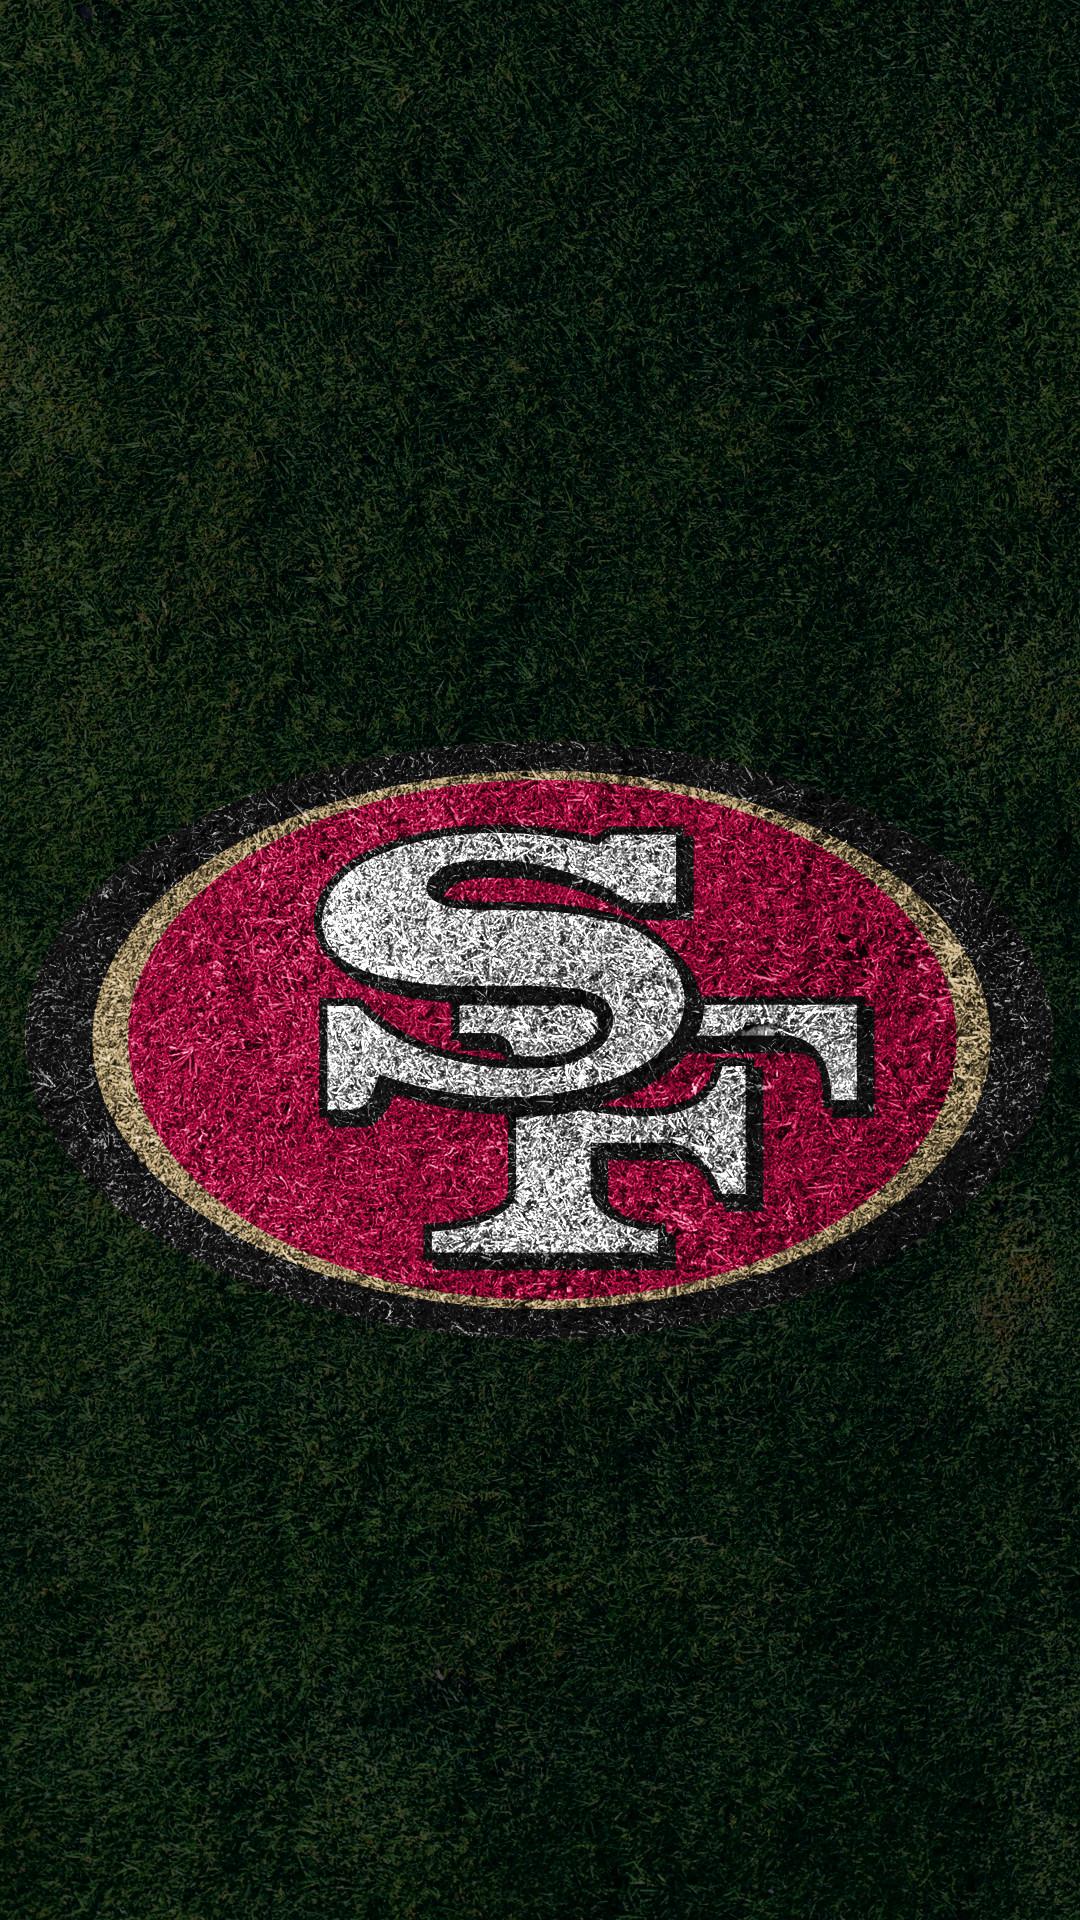 Iphone 49ers Wallpaper San Francisco 49ers Wallpapers 183 ①